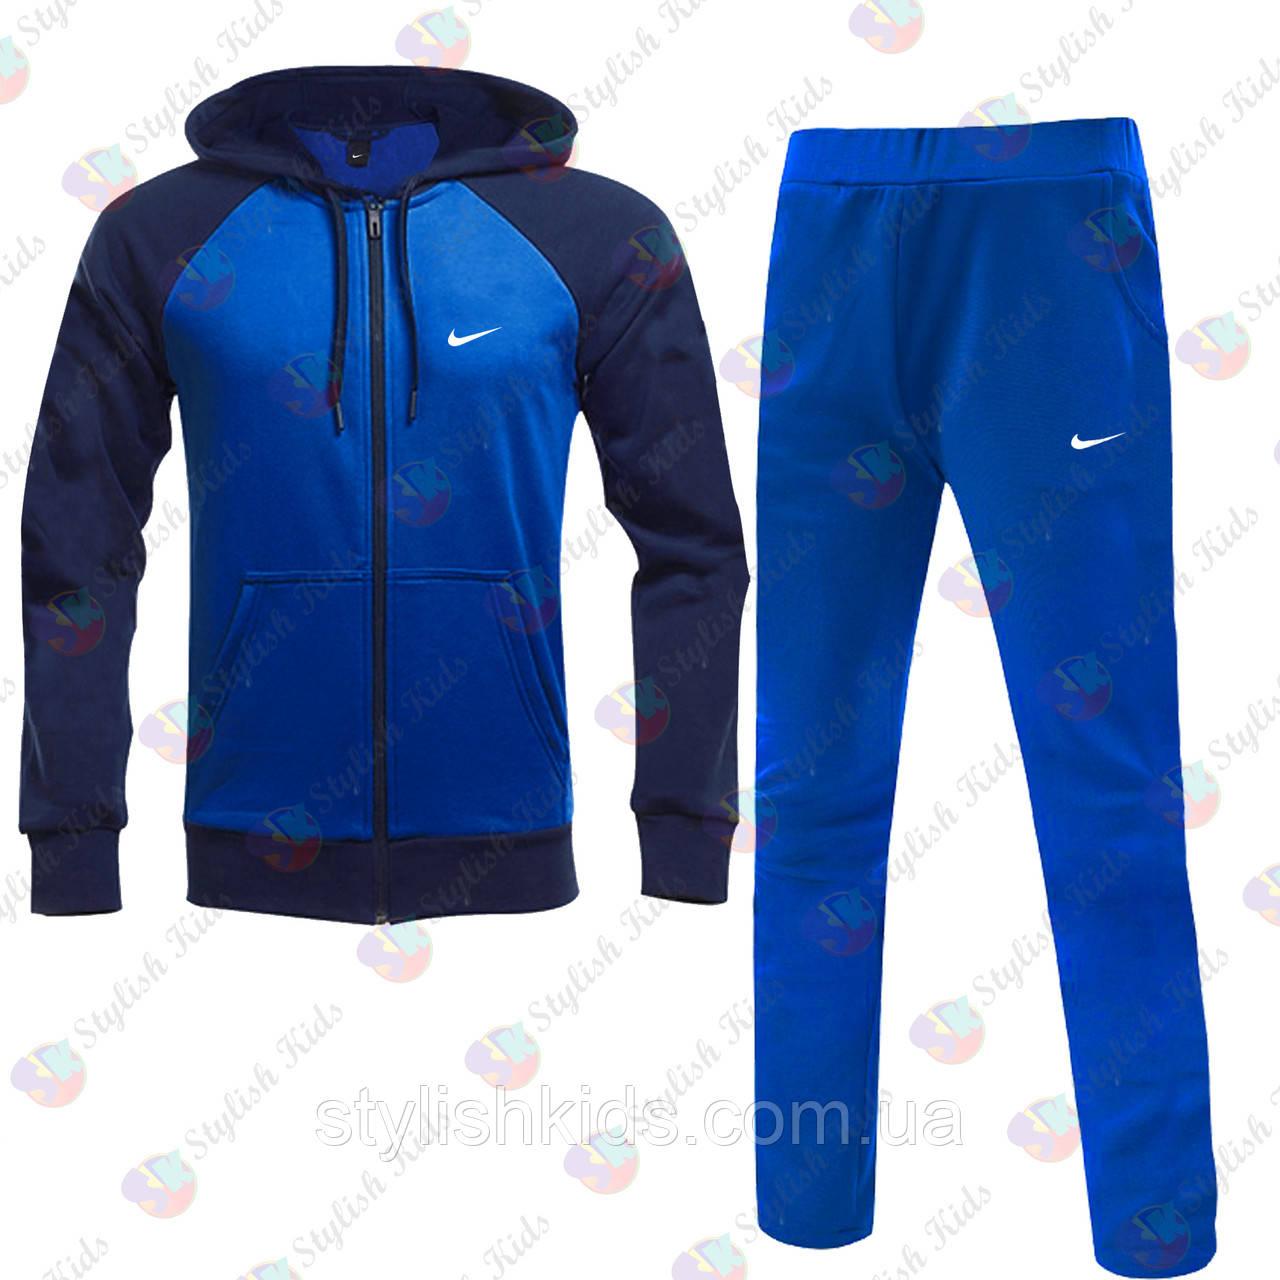 6151eeb9 Купить спортивный костюм Nike на подростка мальчика в Украине.Спортивный  костюм на мальчика 8-